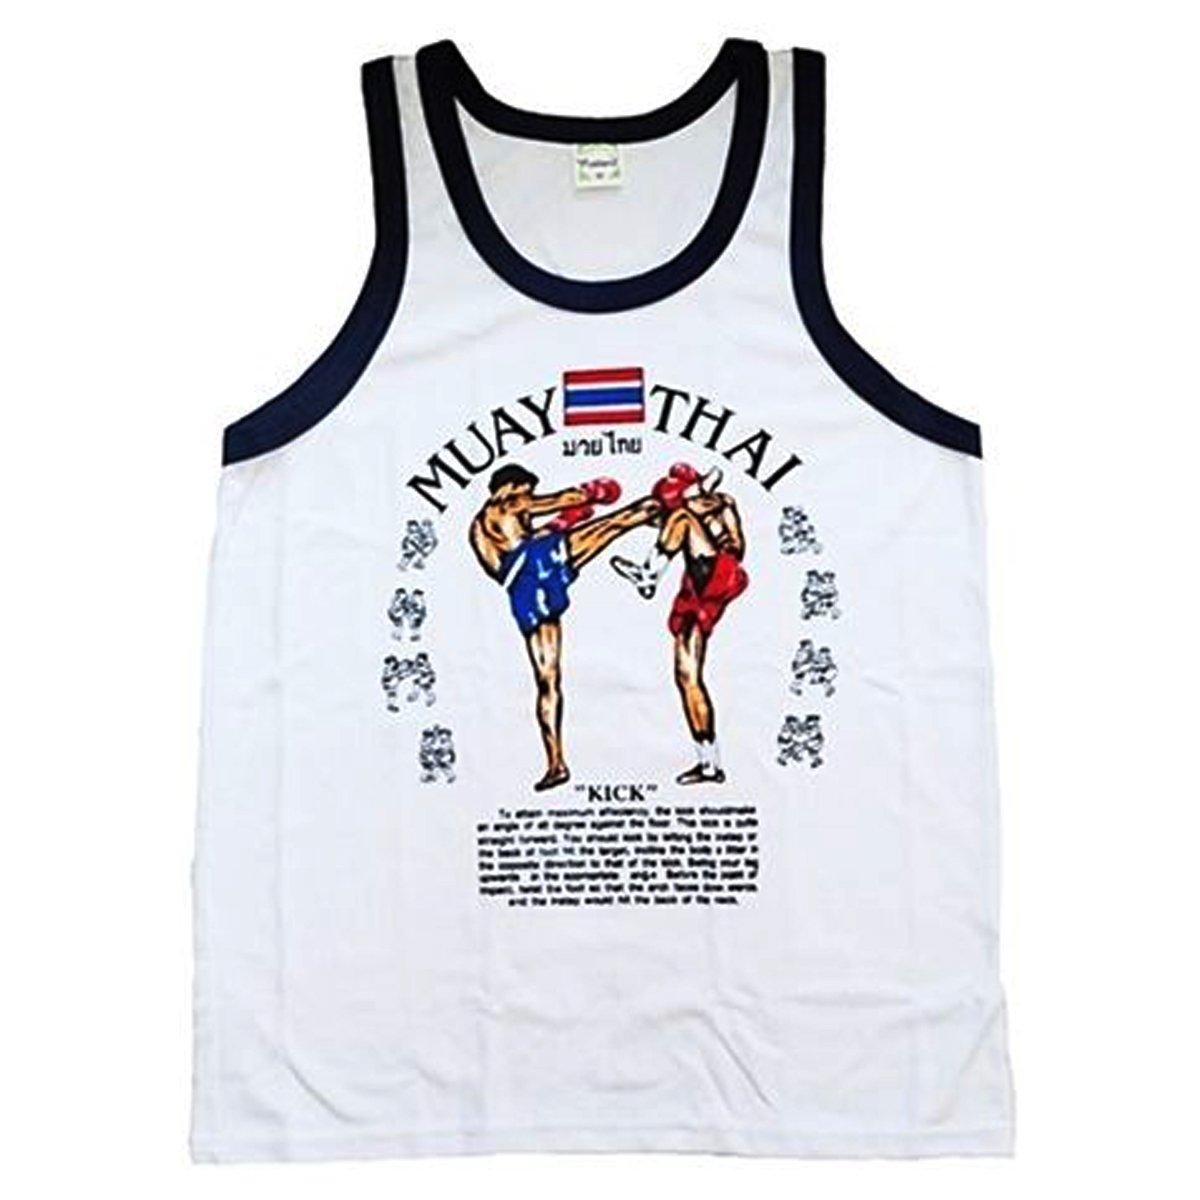 AuthenticAsia Mens Tank Top Singlet Vest Gym Muay Thai Men T-Shirt Cotton 100/% Made in Thailand